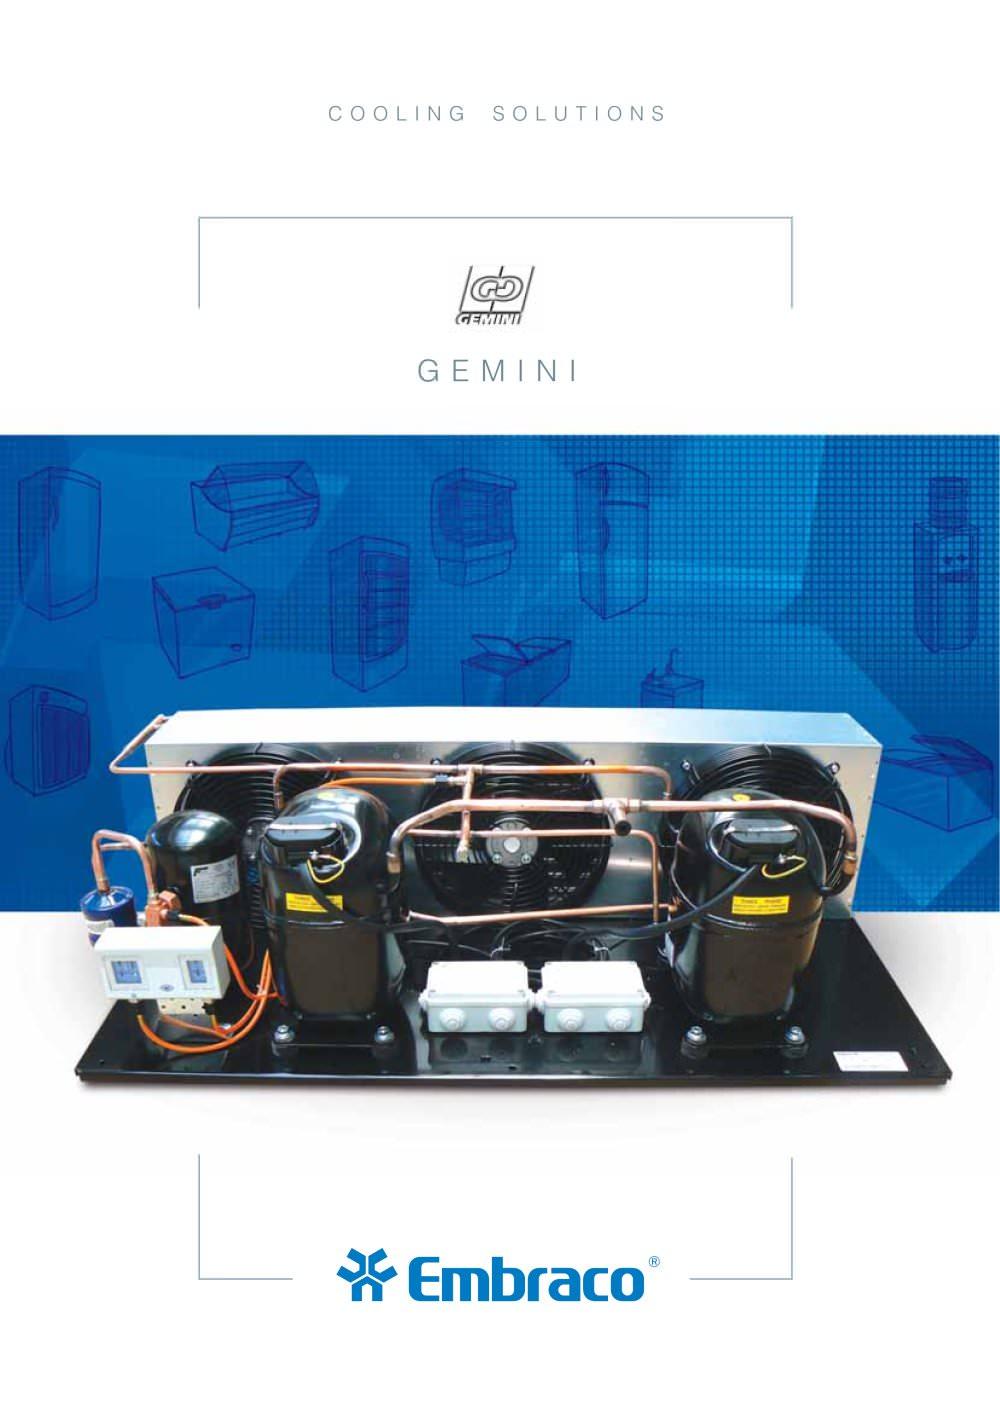 gemini embraco pdf catalogue technical documentation brochure rh pdf directindustry com Gemini Compressors Parts Gemini Compressor Sizing Program